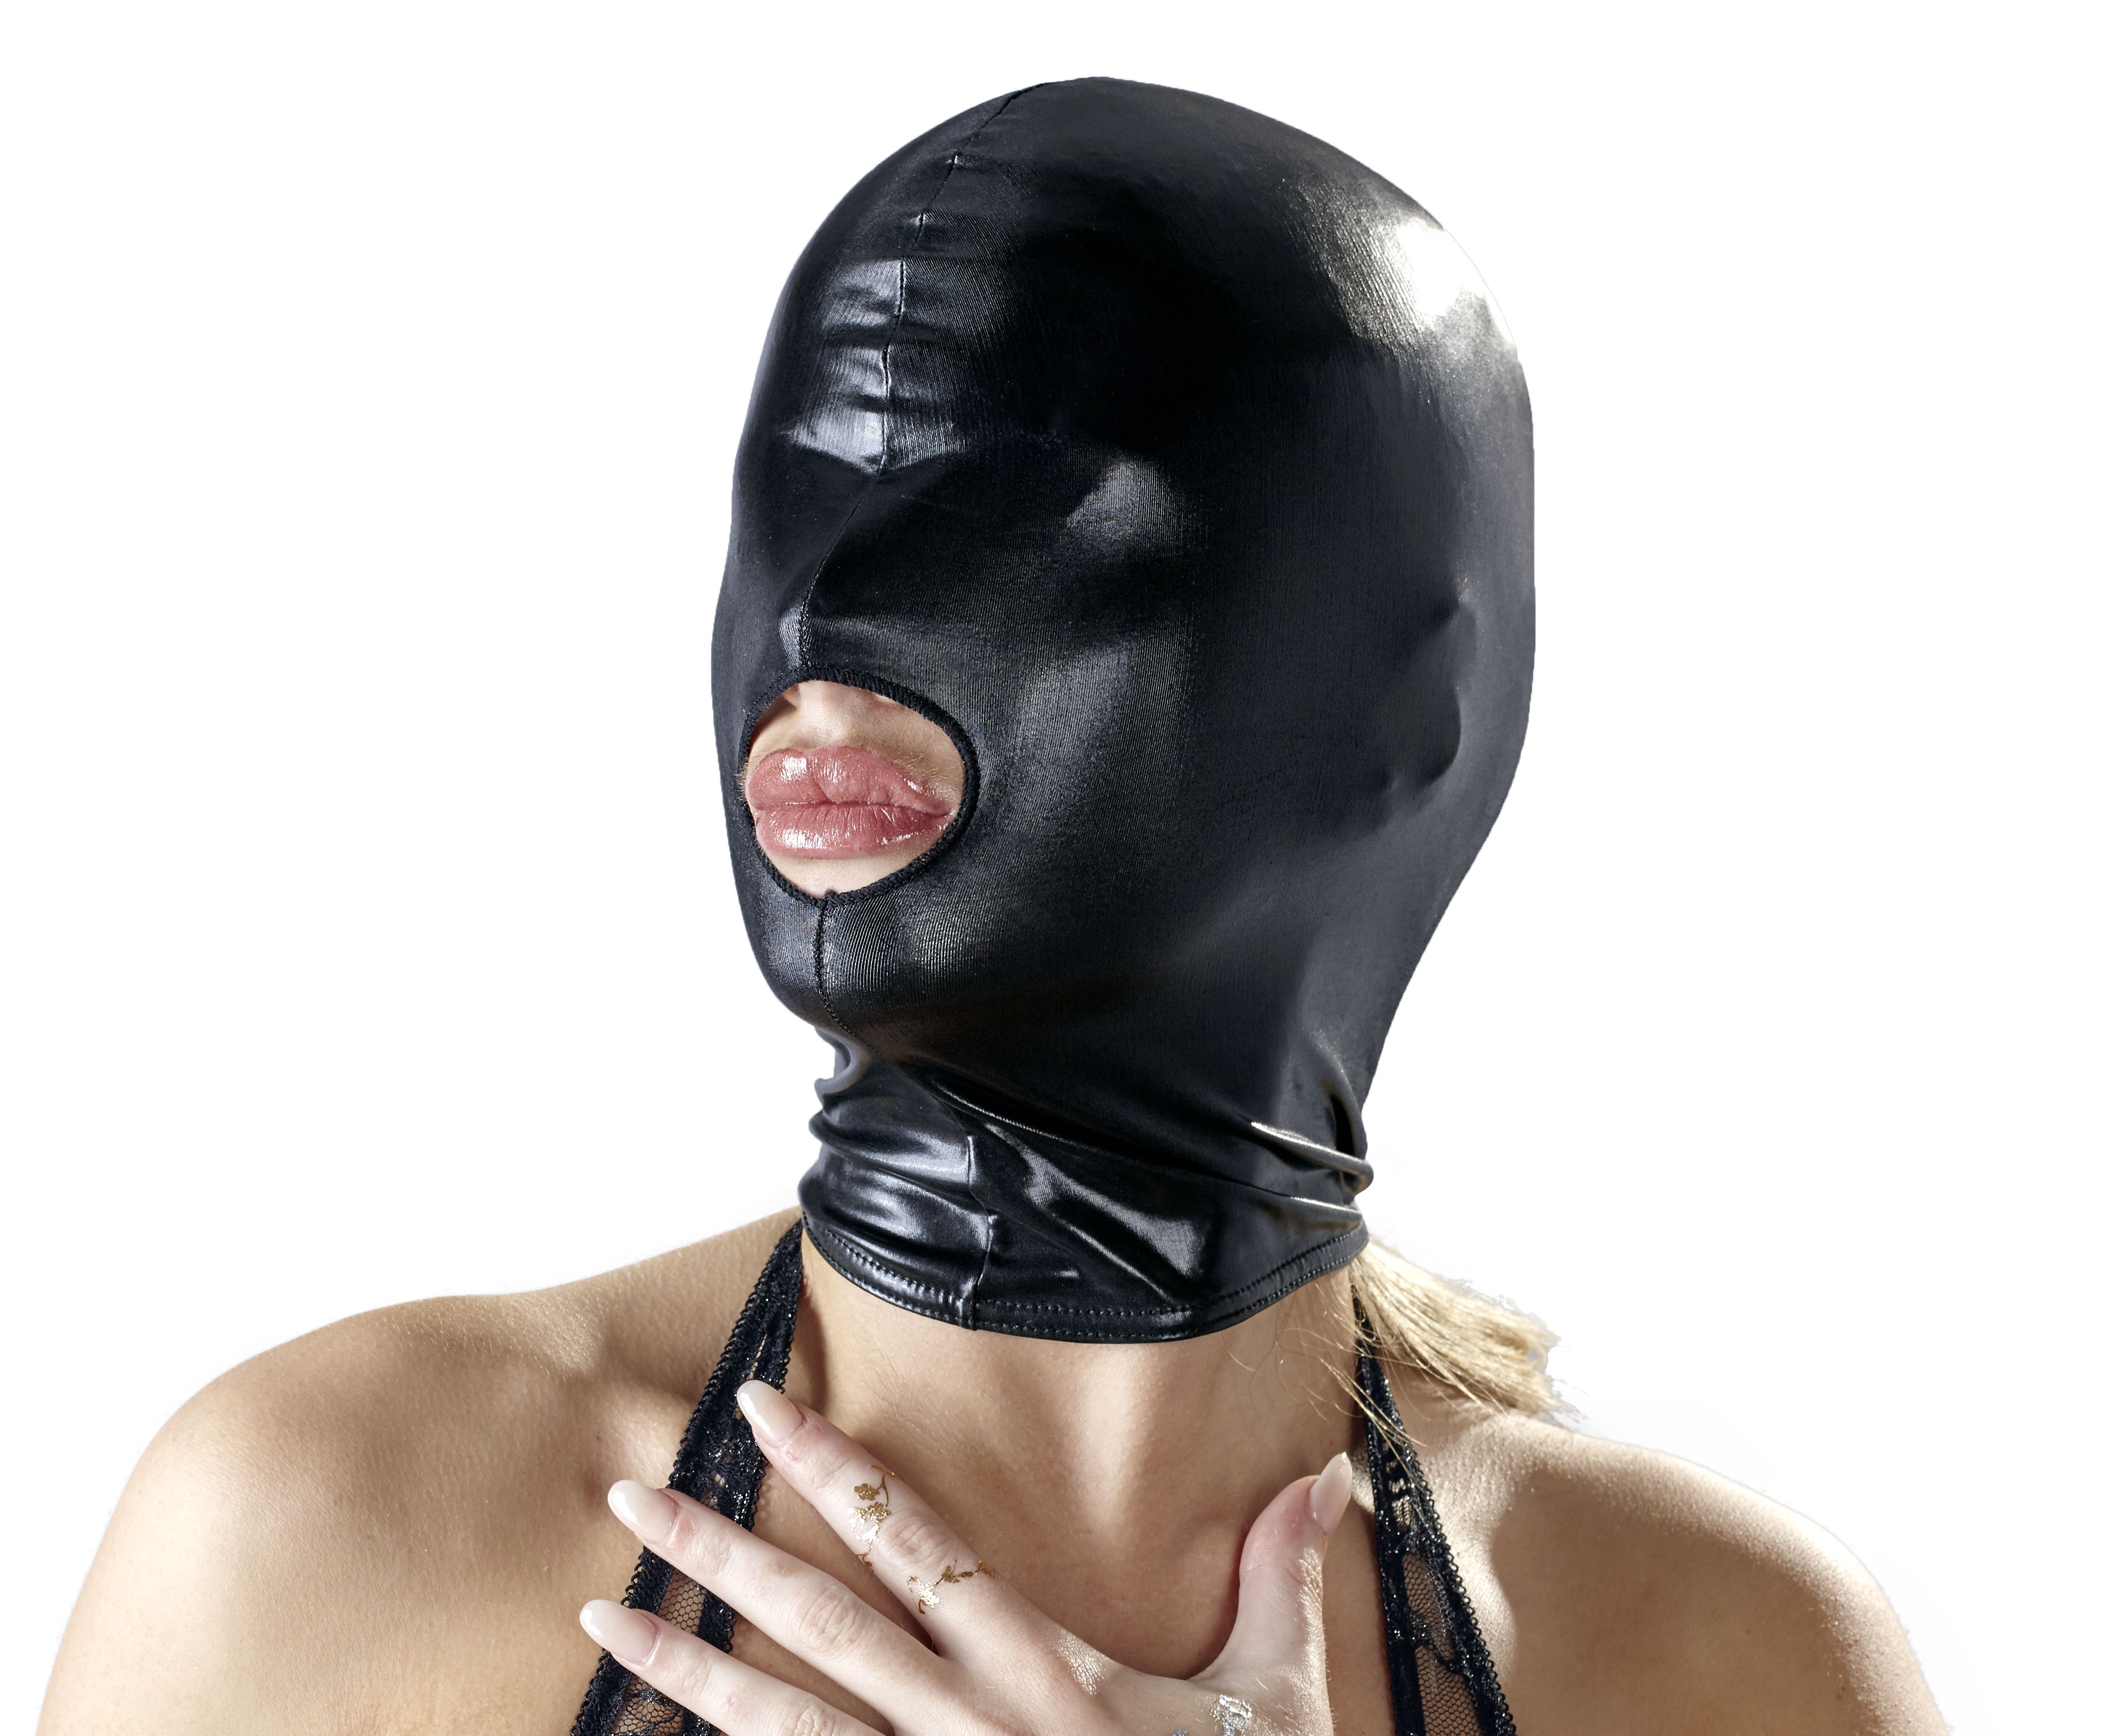 Wetlook Open Mouth Mask | SEXLEKSAKER, BONDAGE & FETISH, Masker & Ögonbindlar, Brands, Bad Kitty | Intimast.se - Sexleksaker